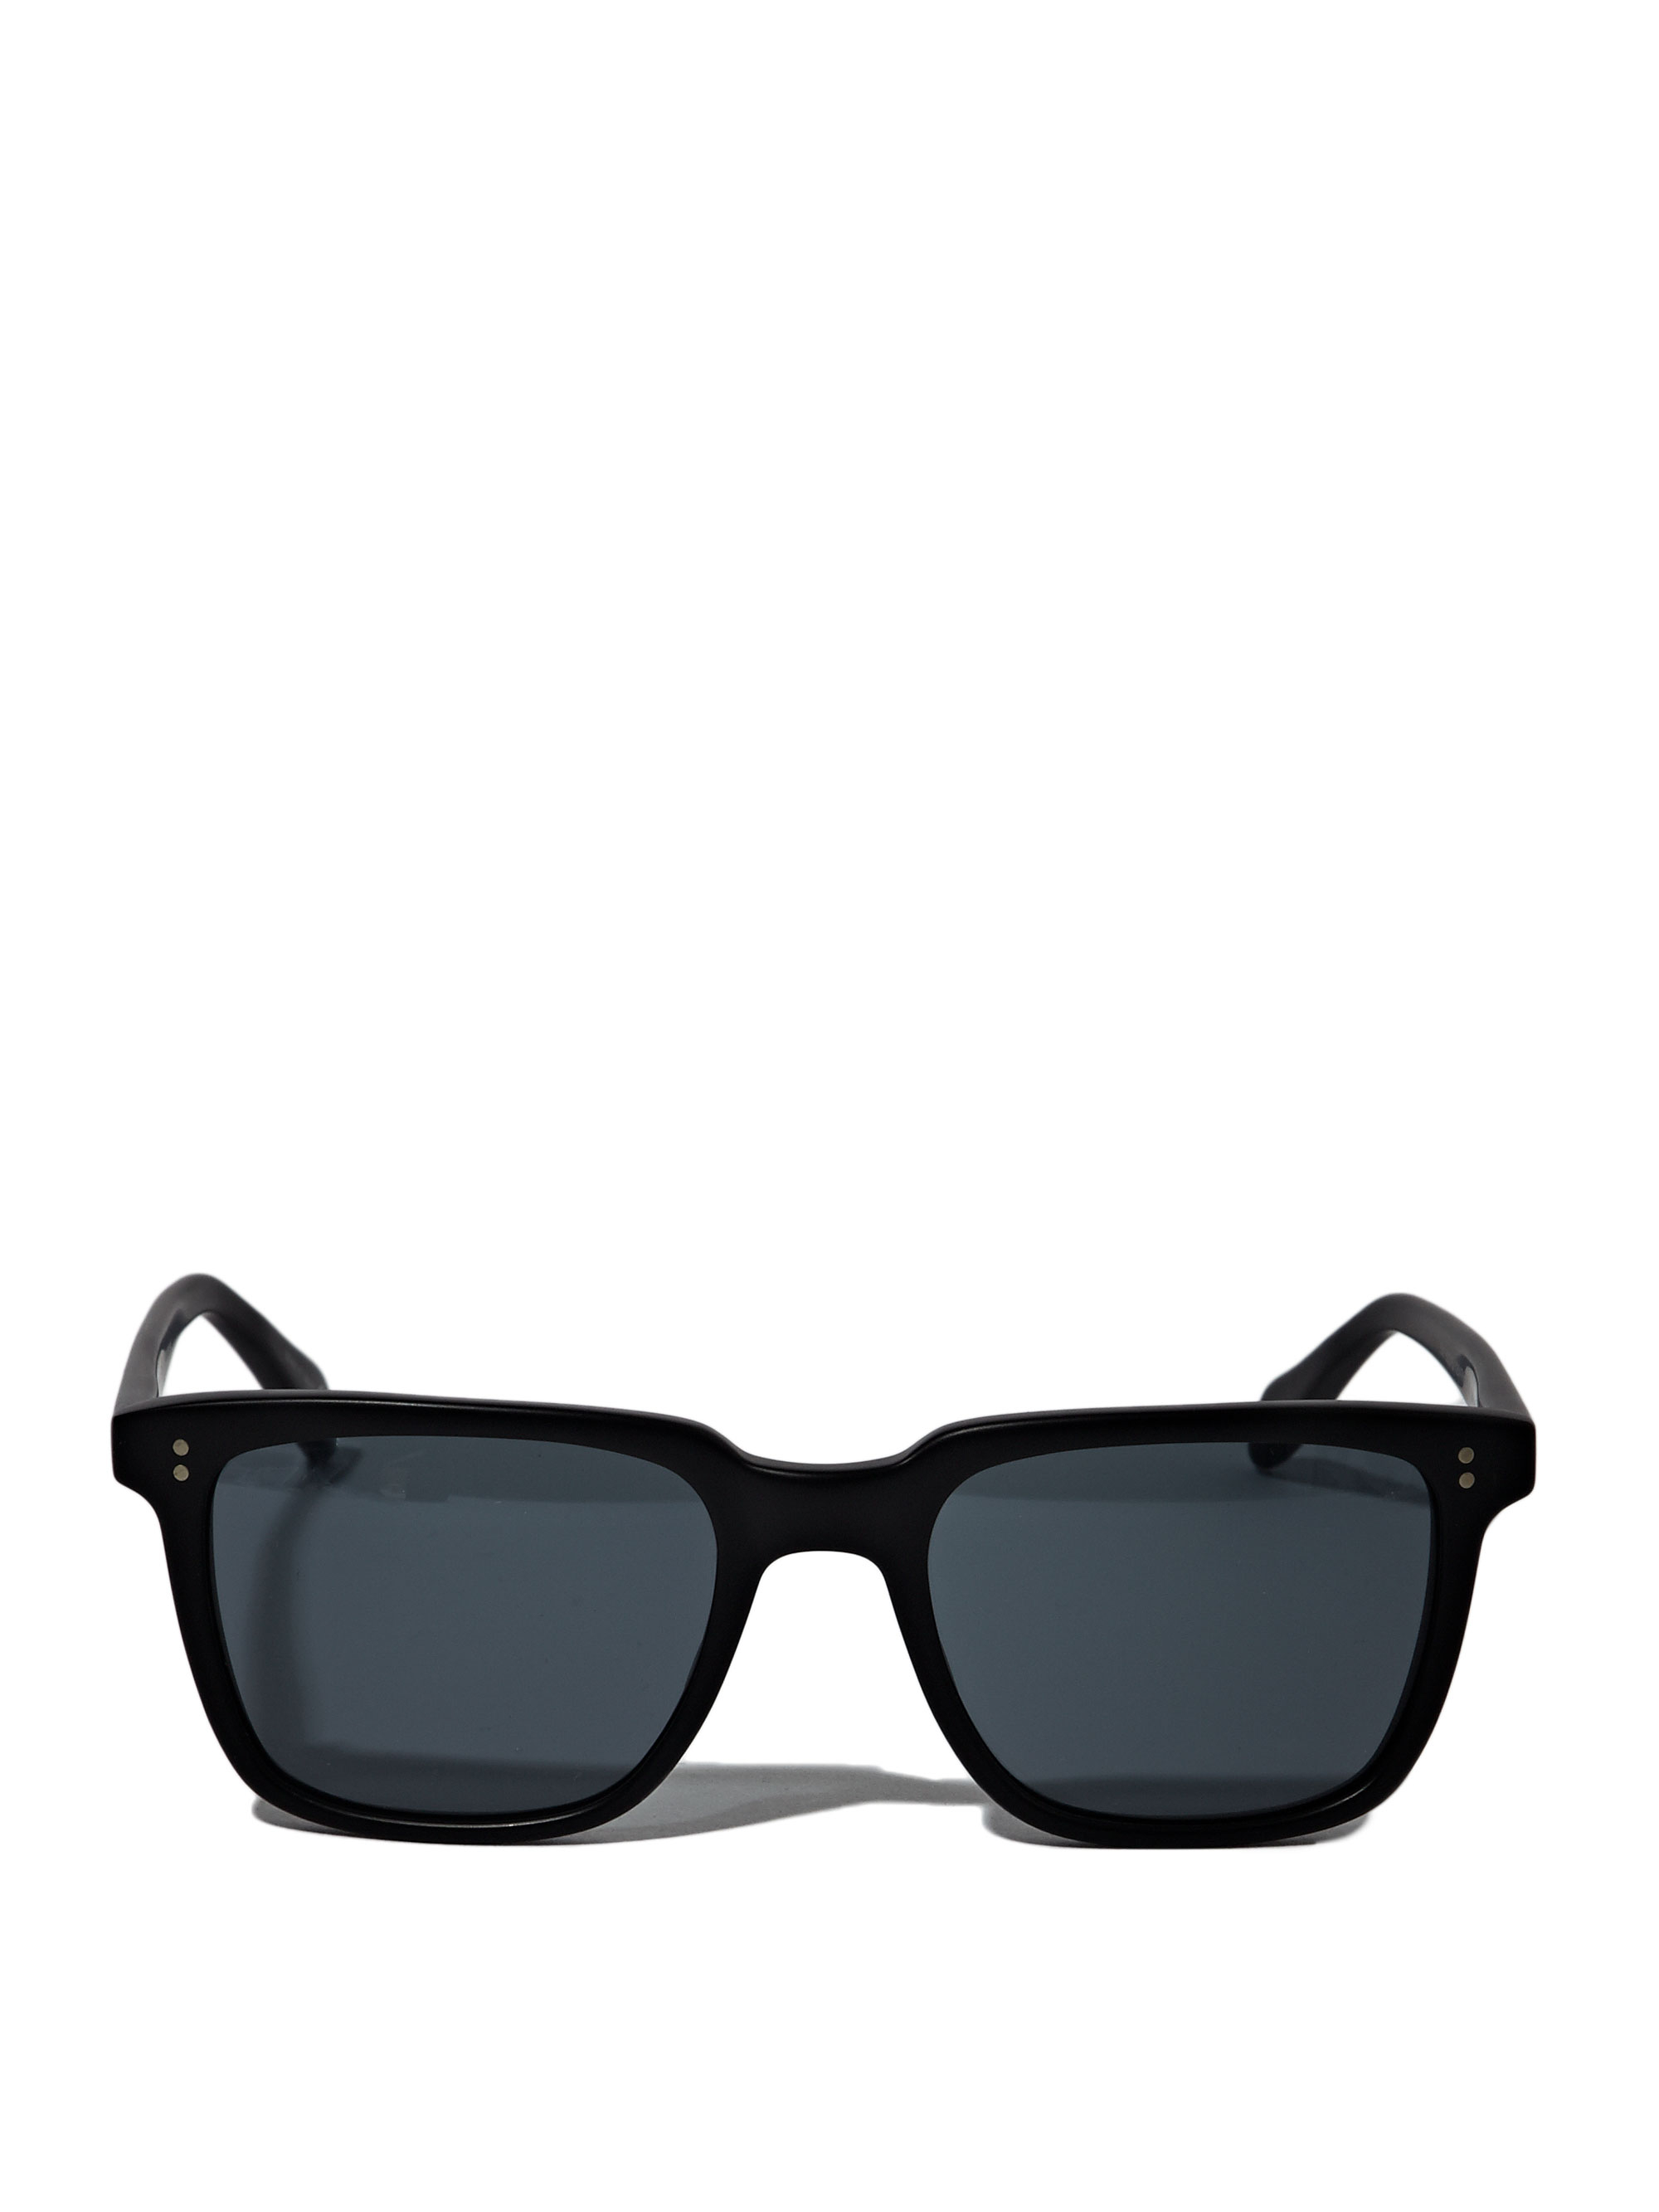 Lyst Oliver Peoples Mens Ndg Sunglasses In Black For Men